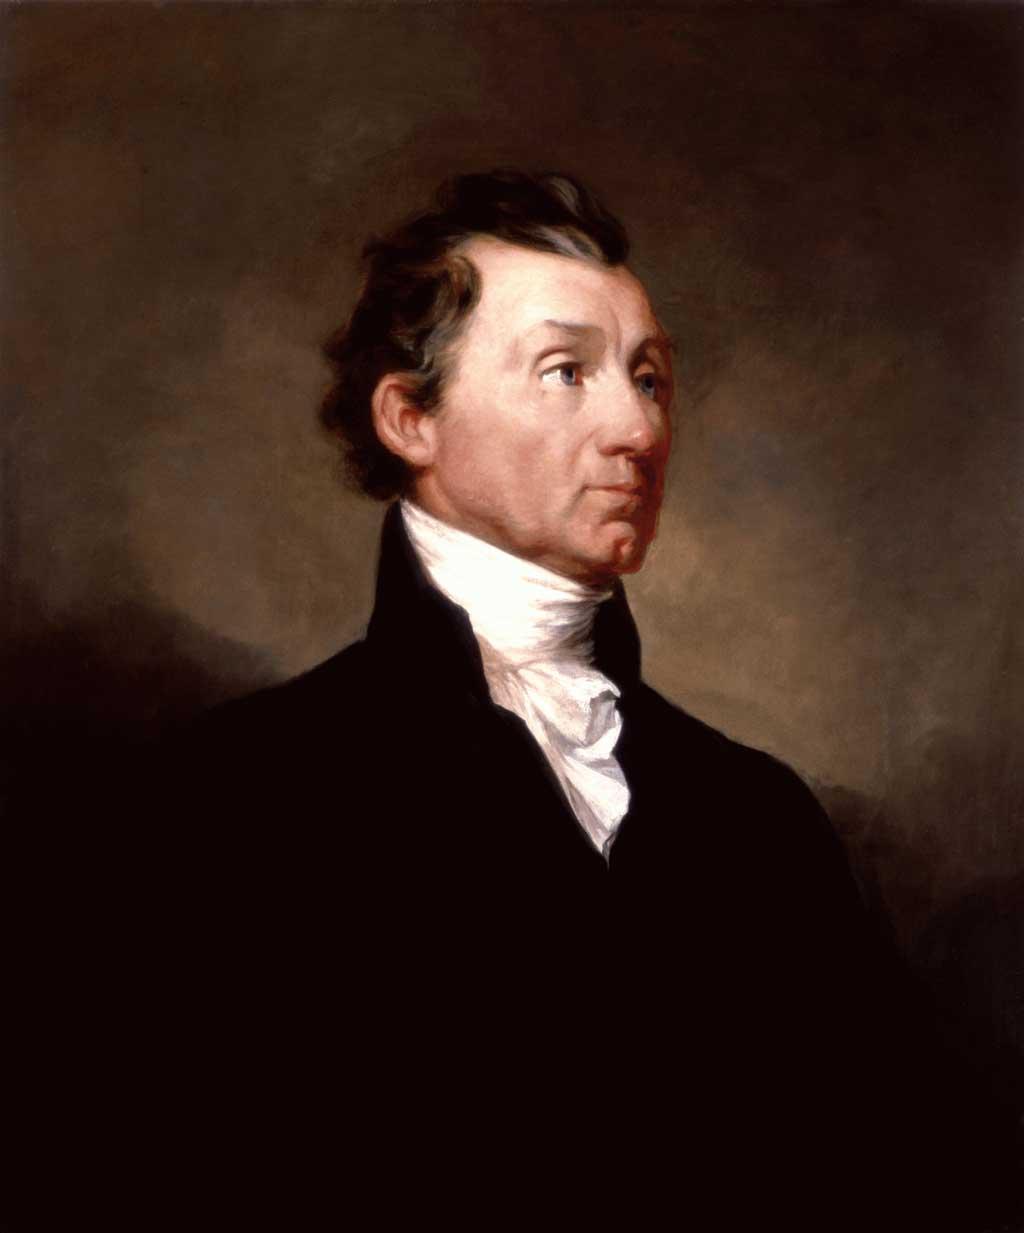 Official White House portrait of James Monroe